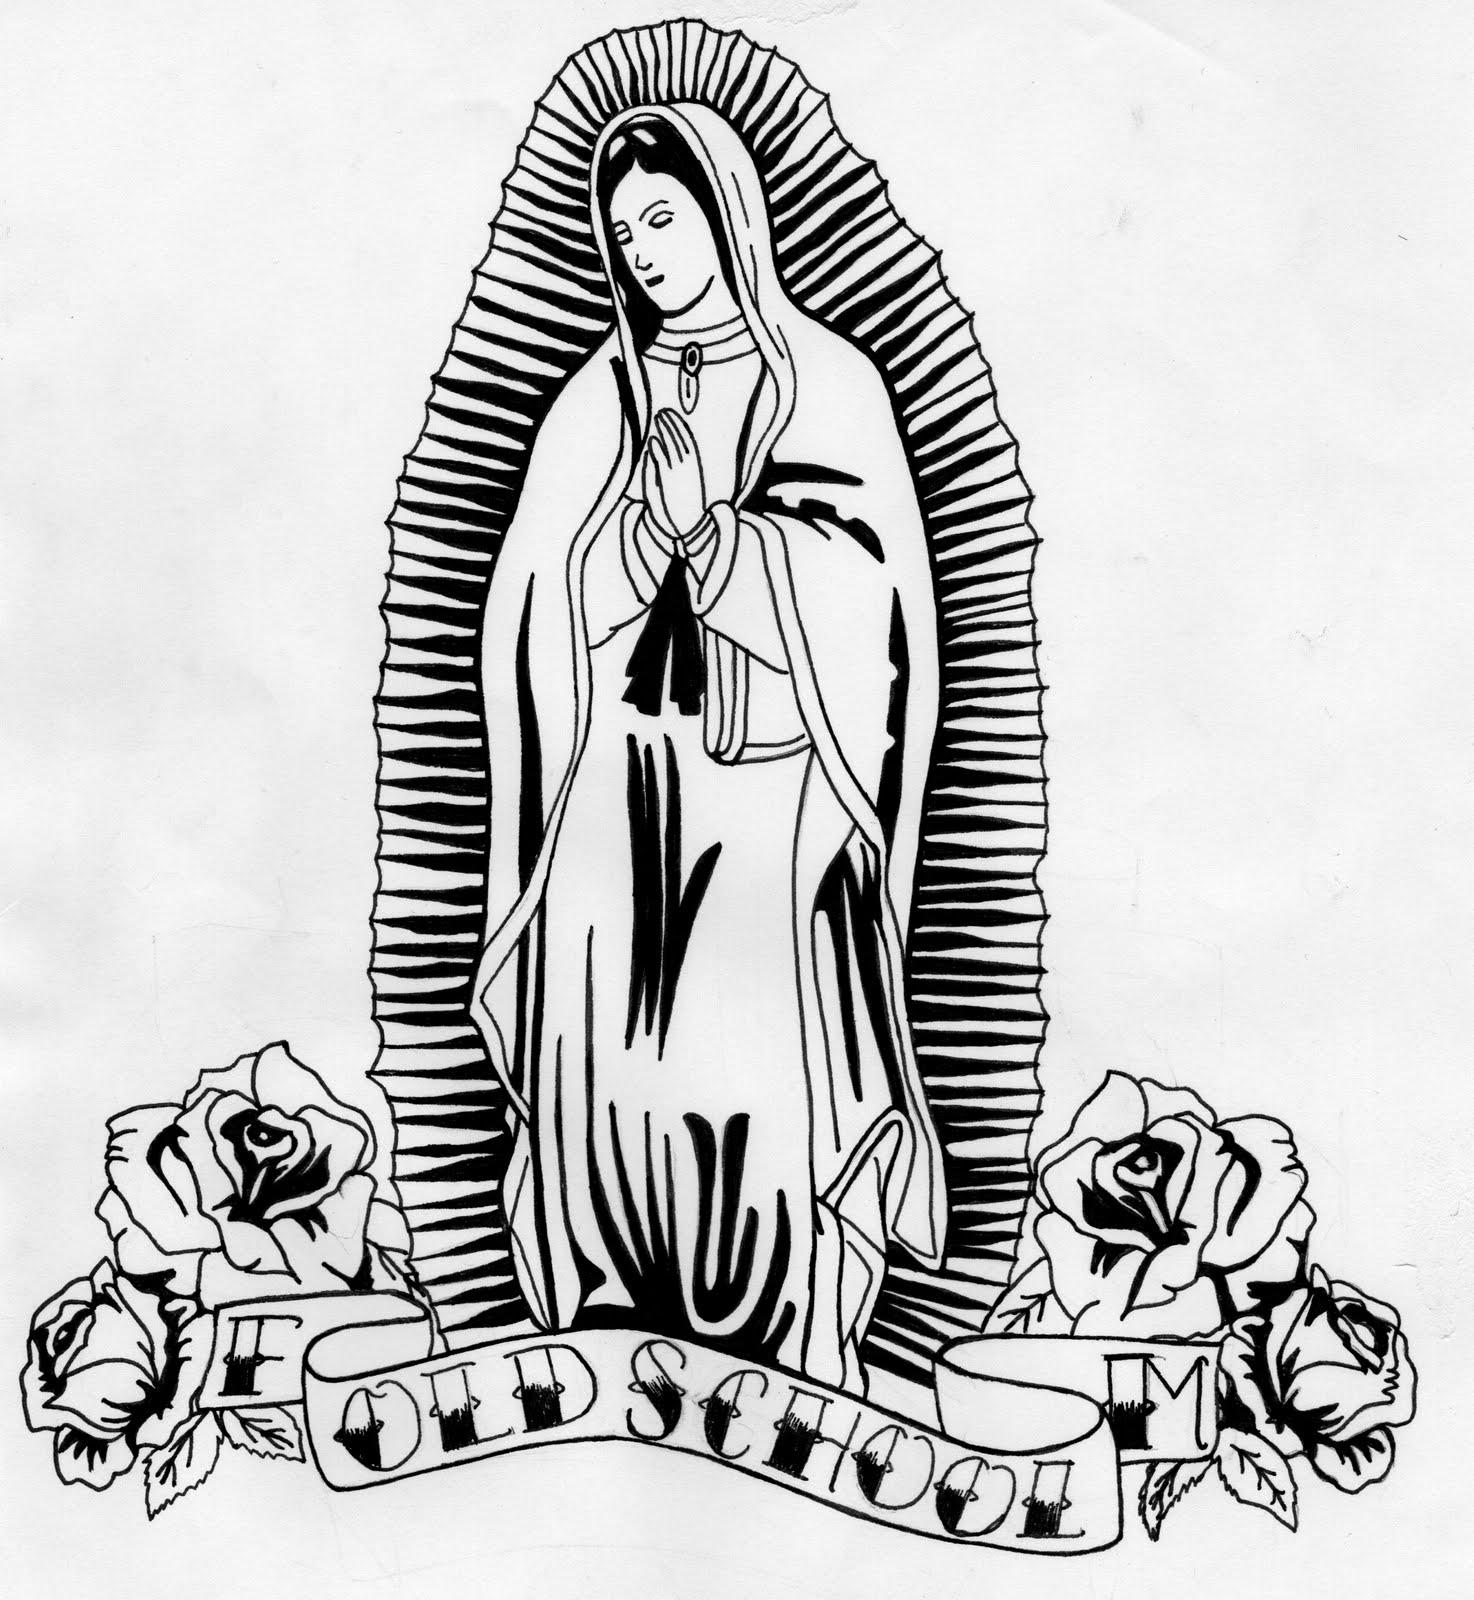 Virgen de Guadalupe image para dibujar - Imagui